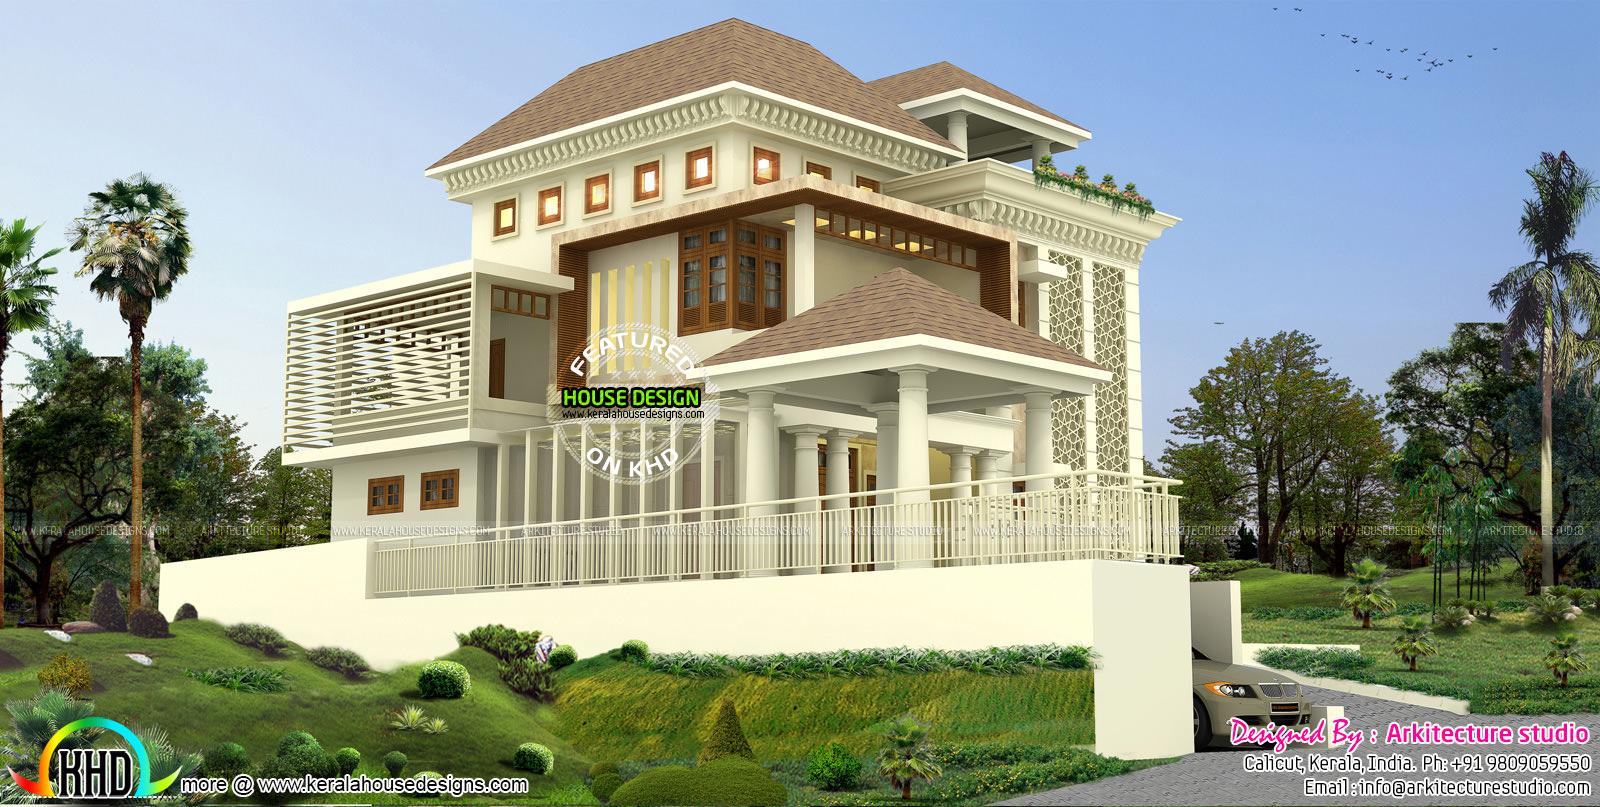 500 sq yd modern house architecture kerala home design for Home design 500 sq yard